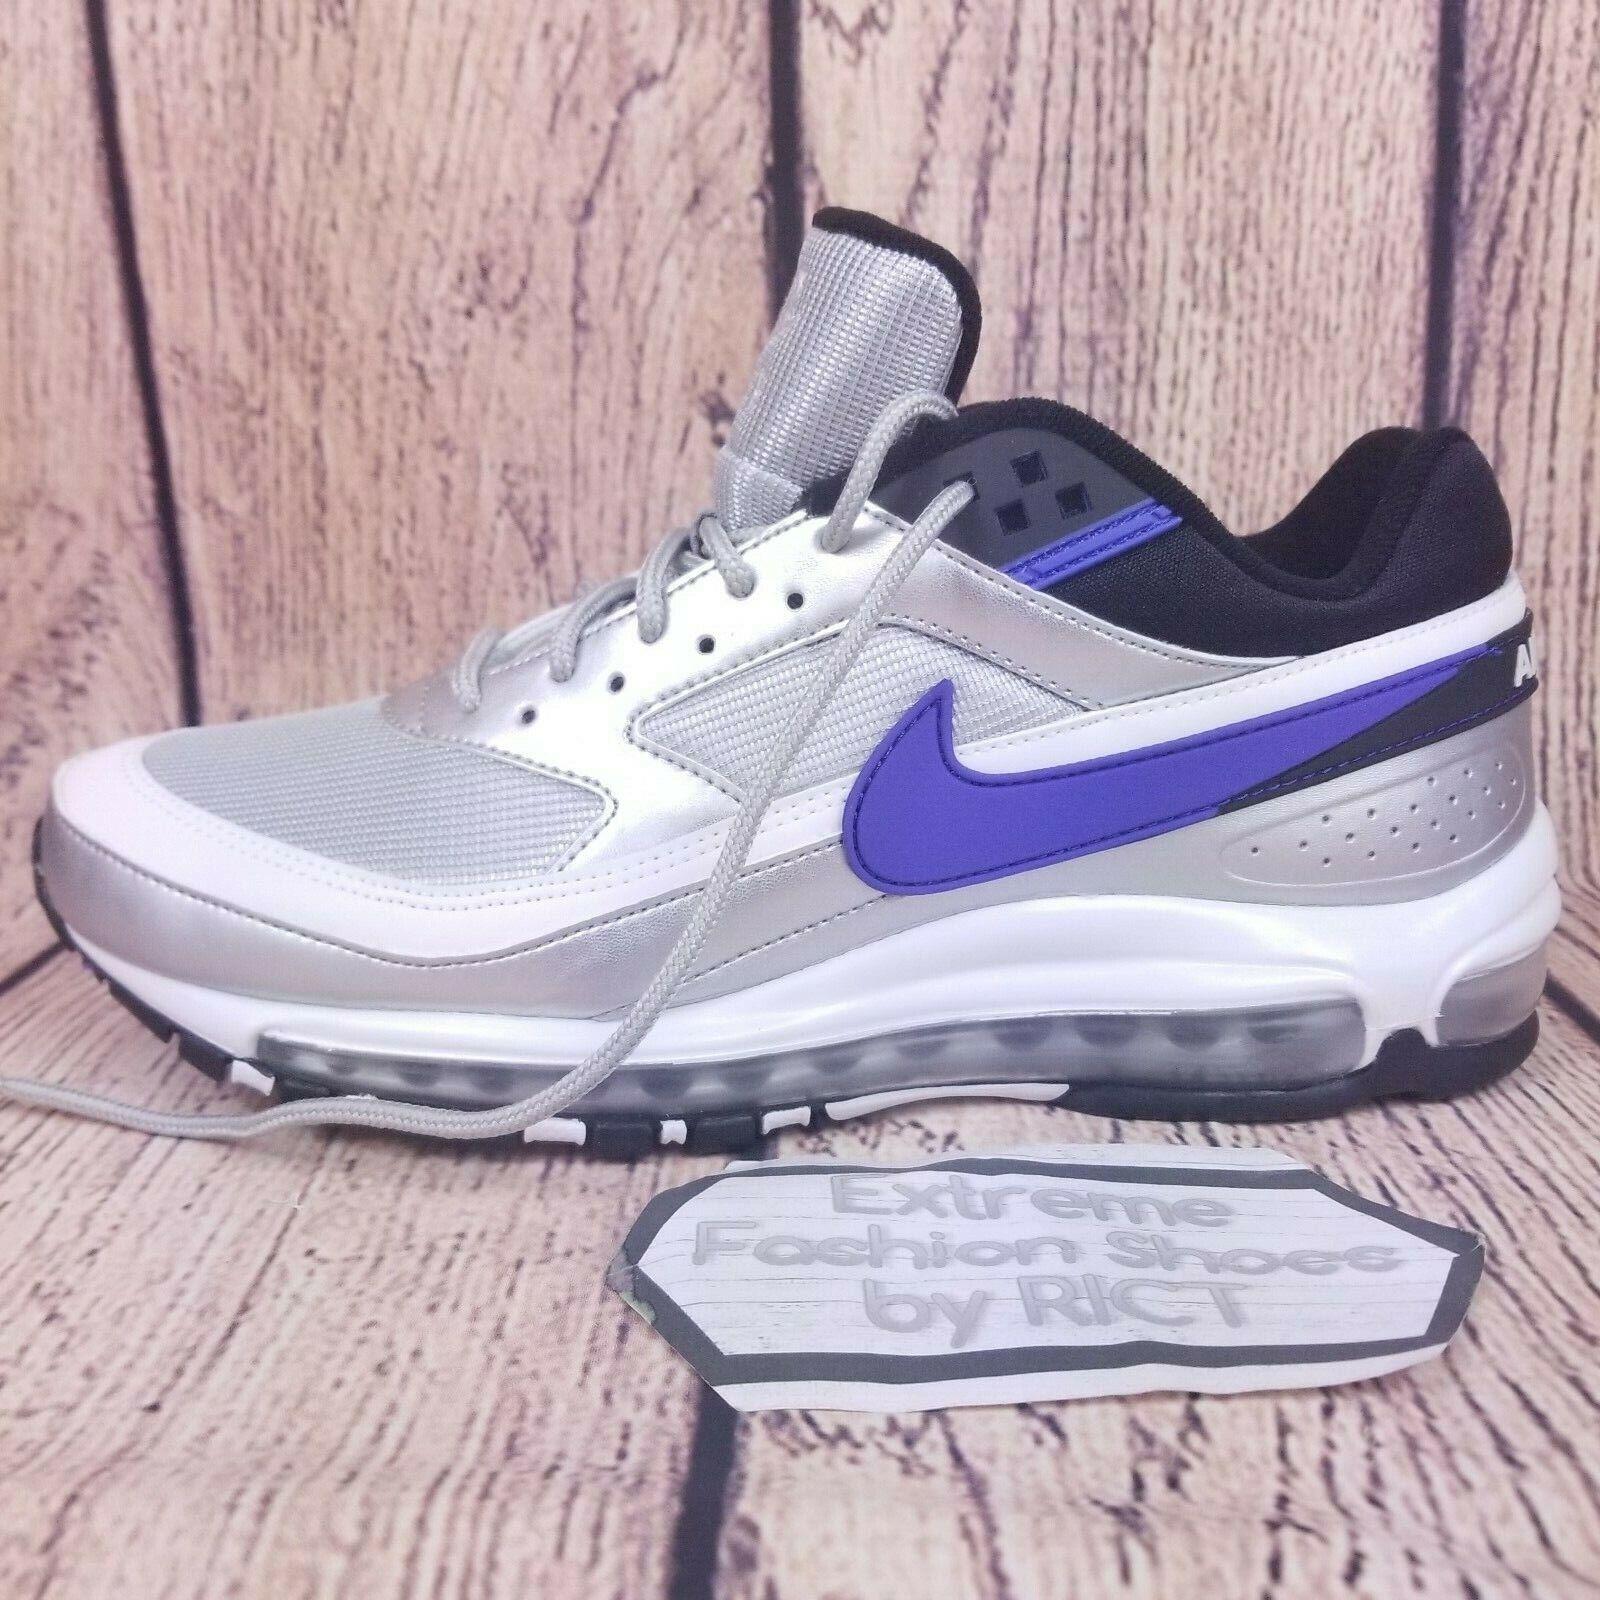 Mens Nike Air Max 97 BW argentoo metallico viola nero bianca Dimensione 11 AO2406 002